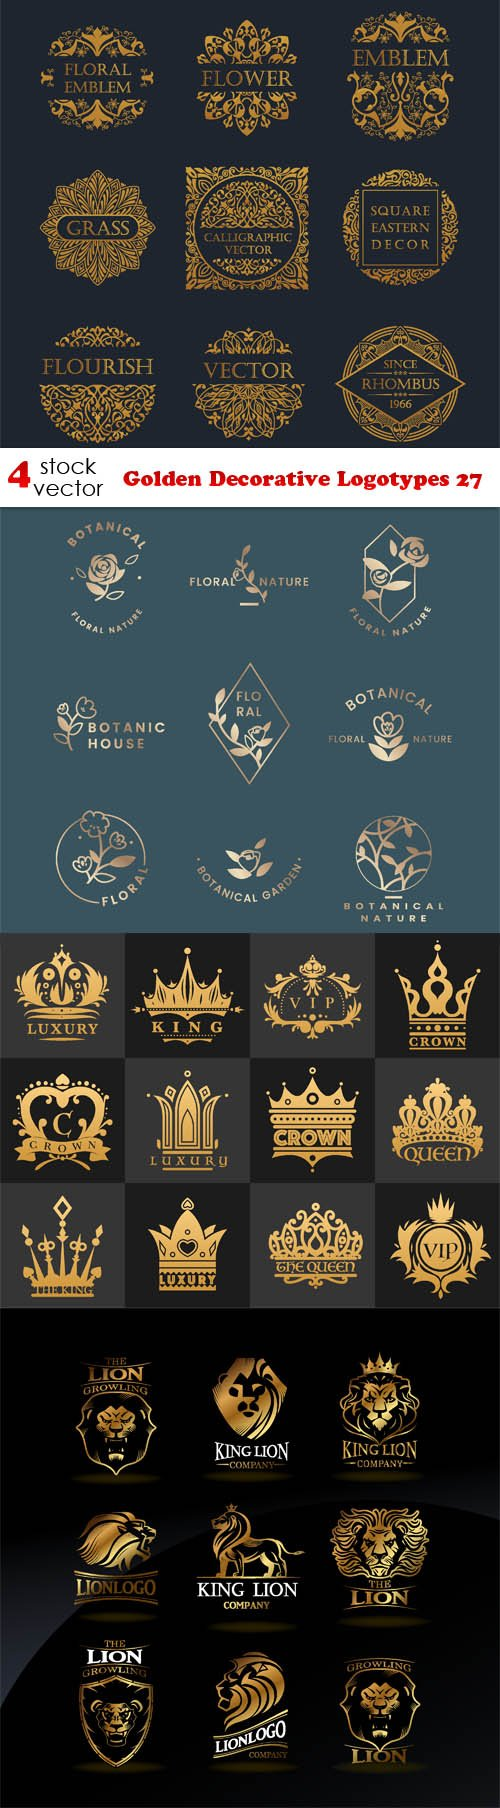 Vectors - Golden Decorative Logotypes 27